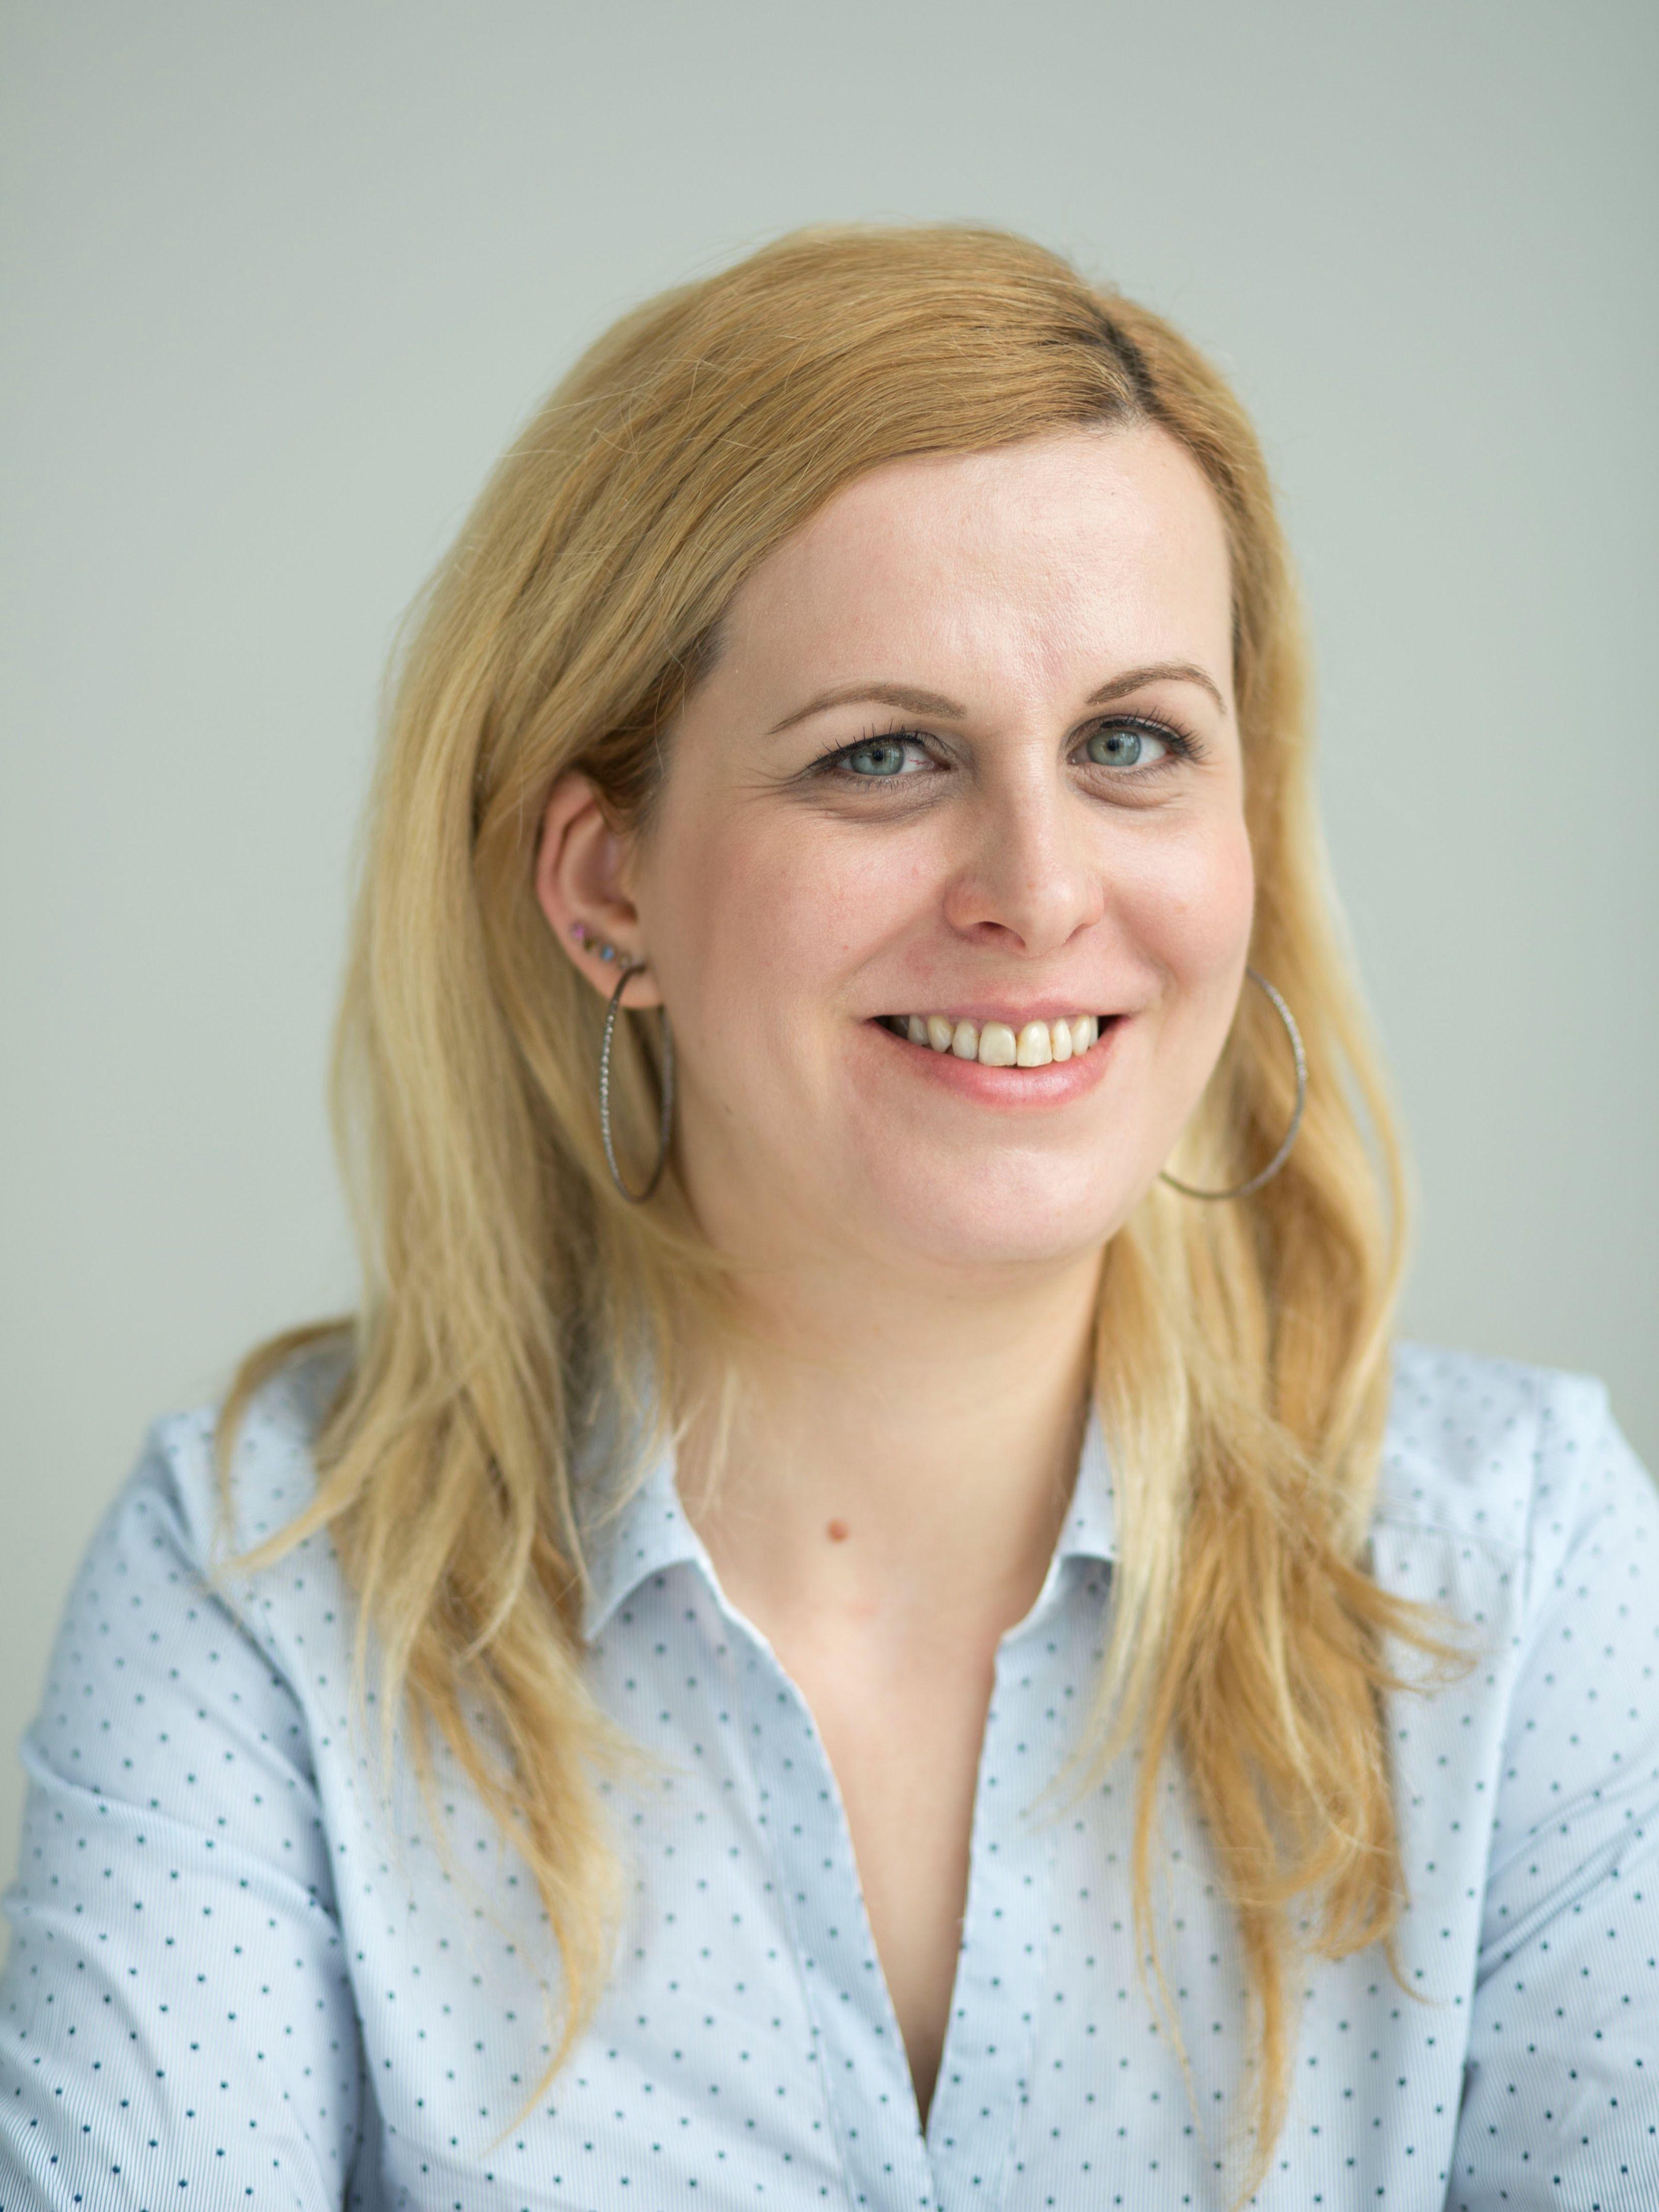 Krisztina Kolozsvari